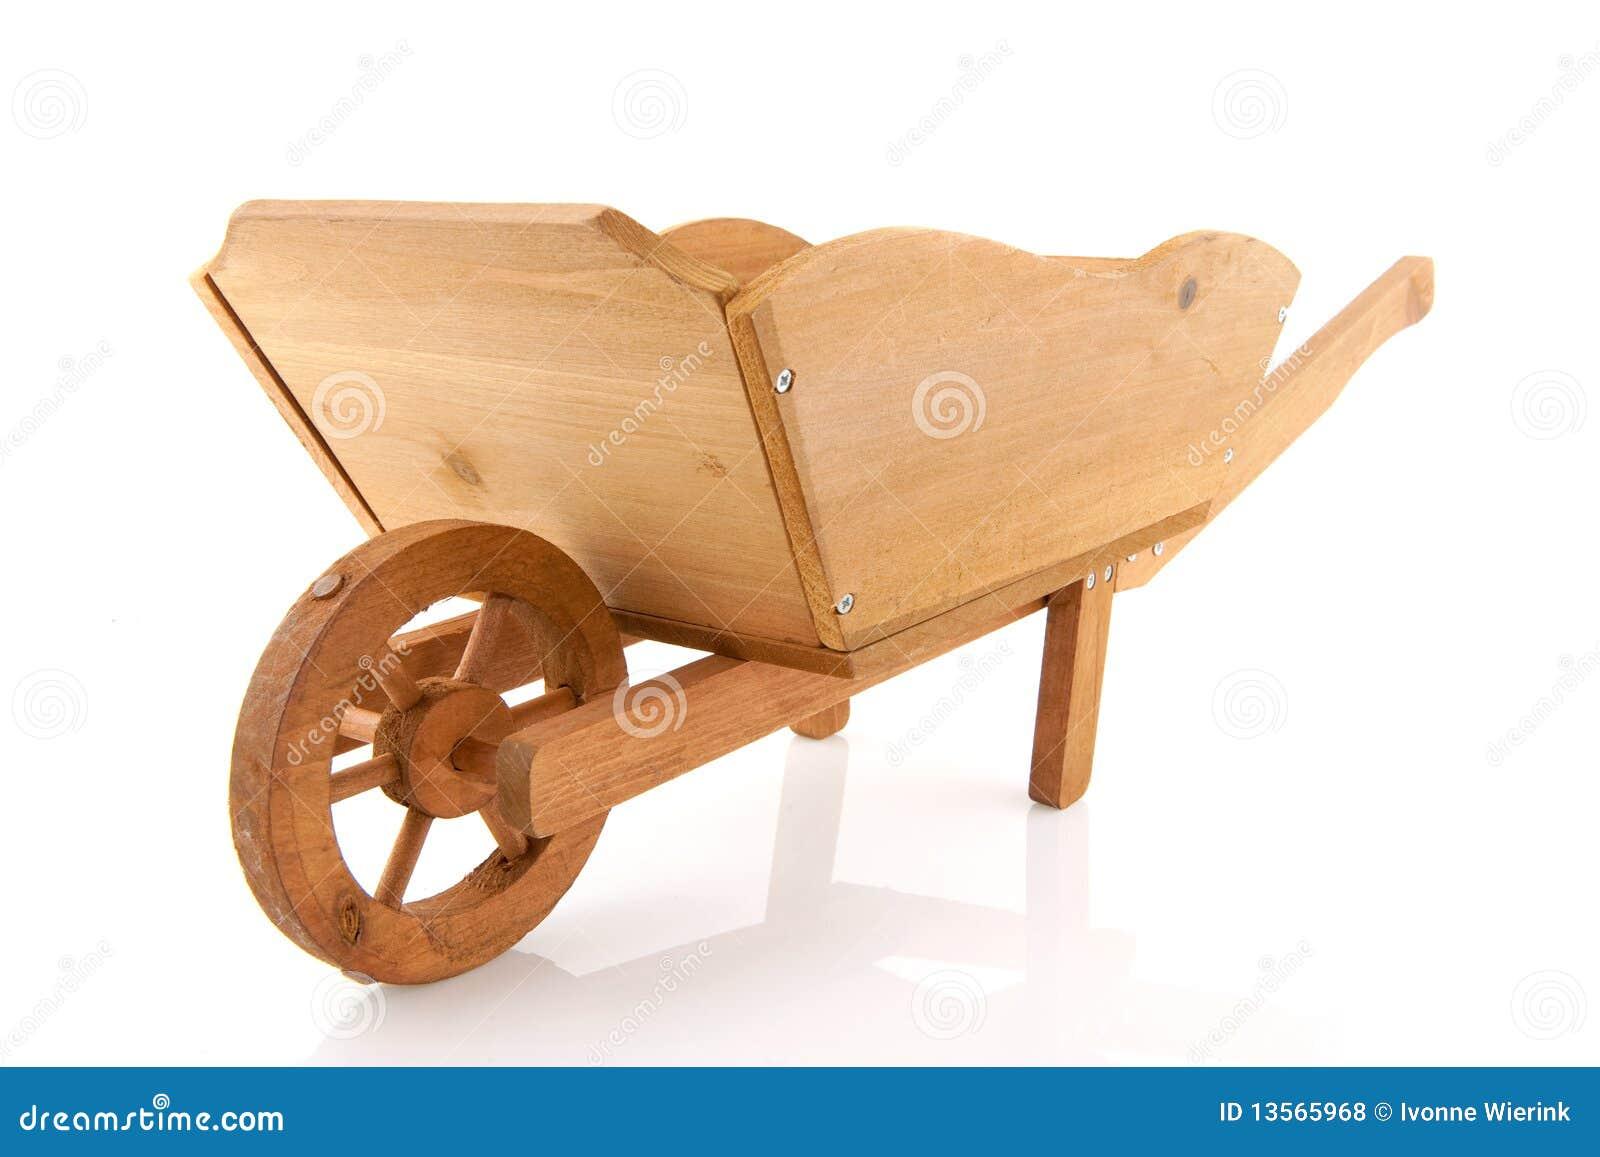 Carriola di legno fotografie stock libere da diritti immagine 13565968 - Carriola in legno da giardino ...